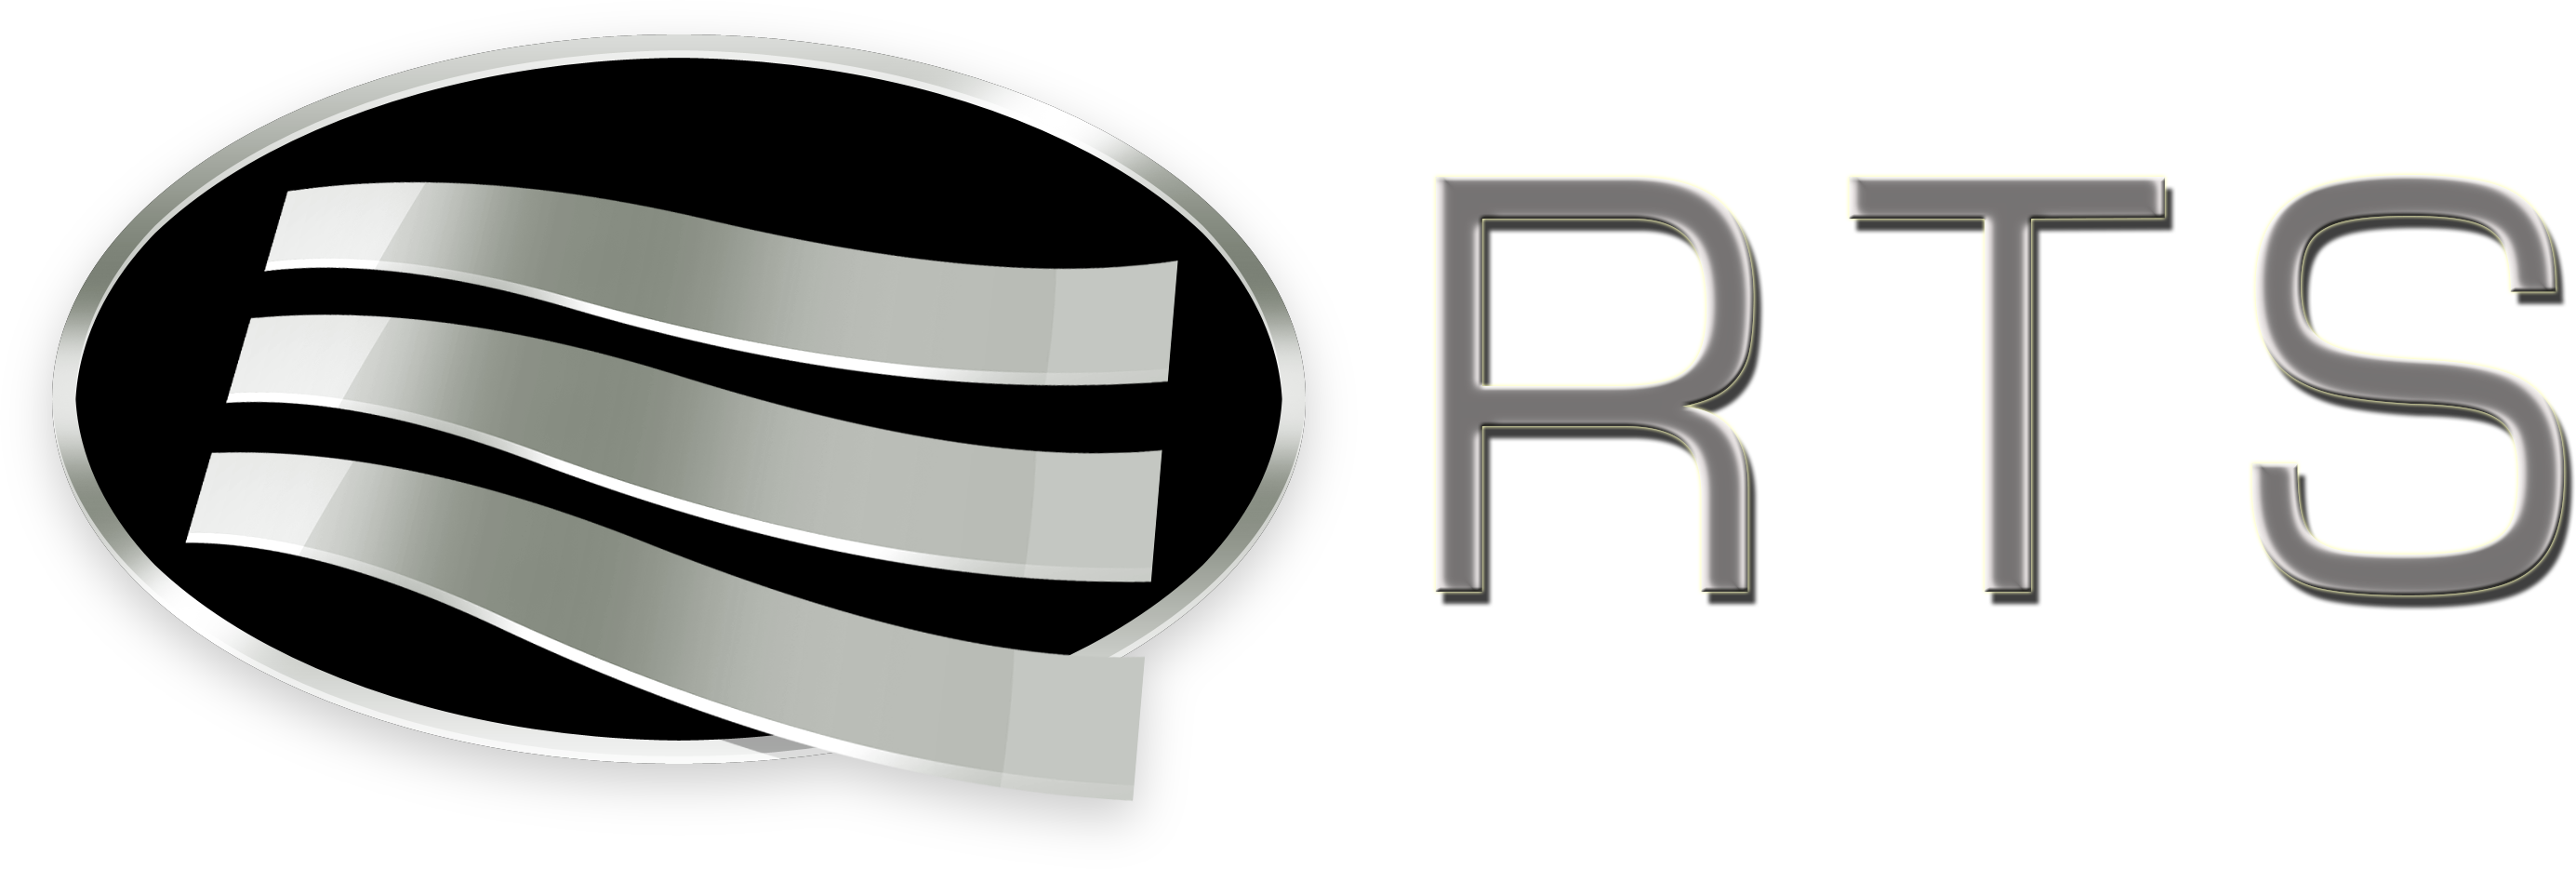 Retail Technology Services Ltd Logo